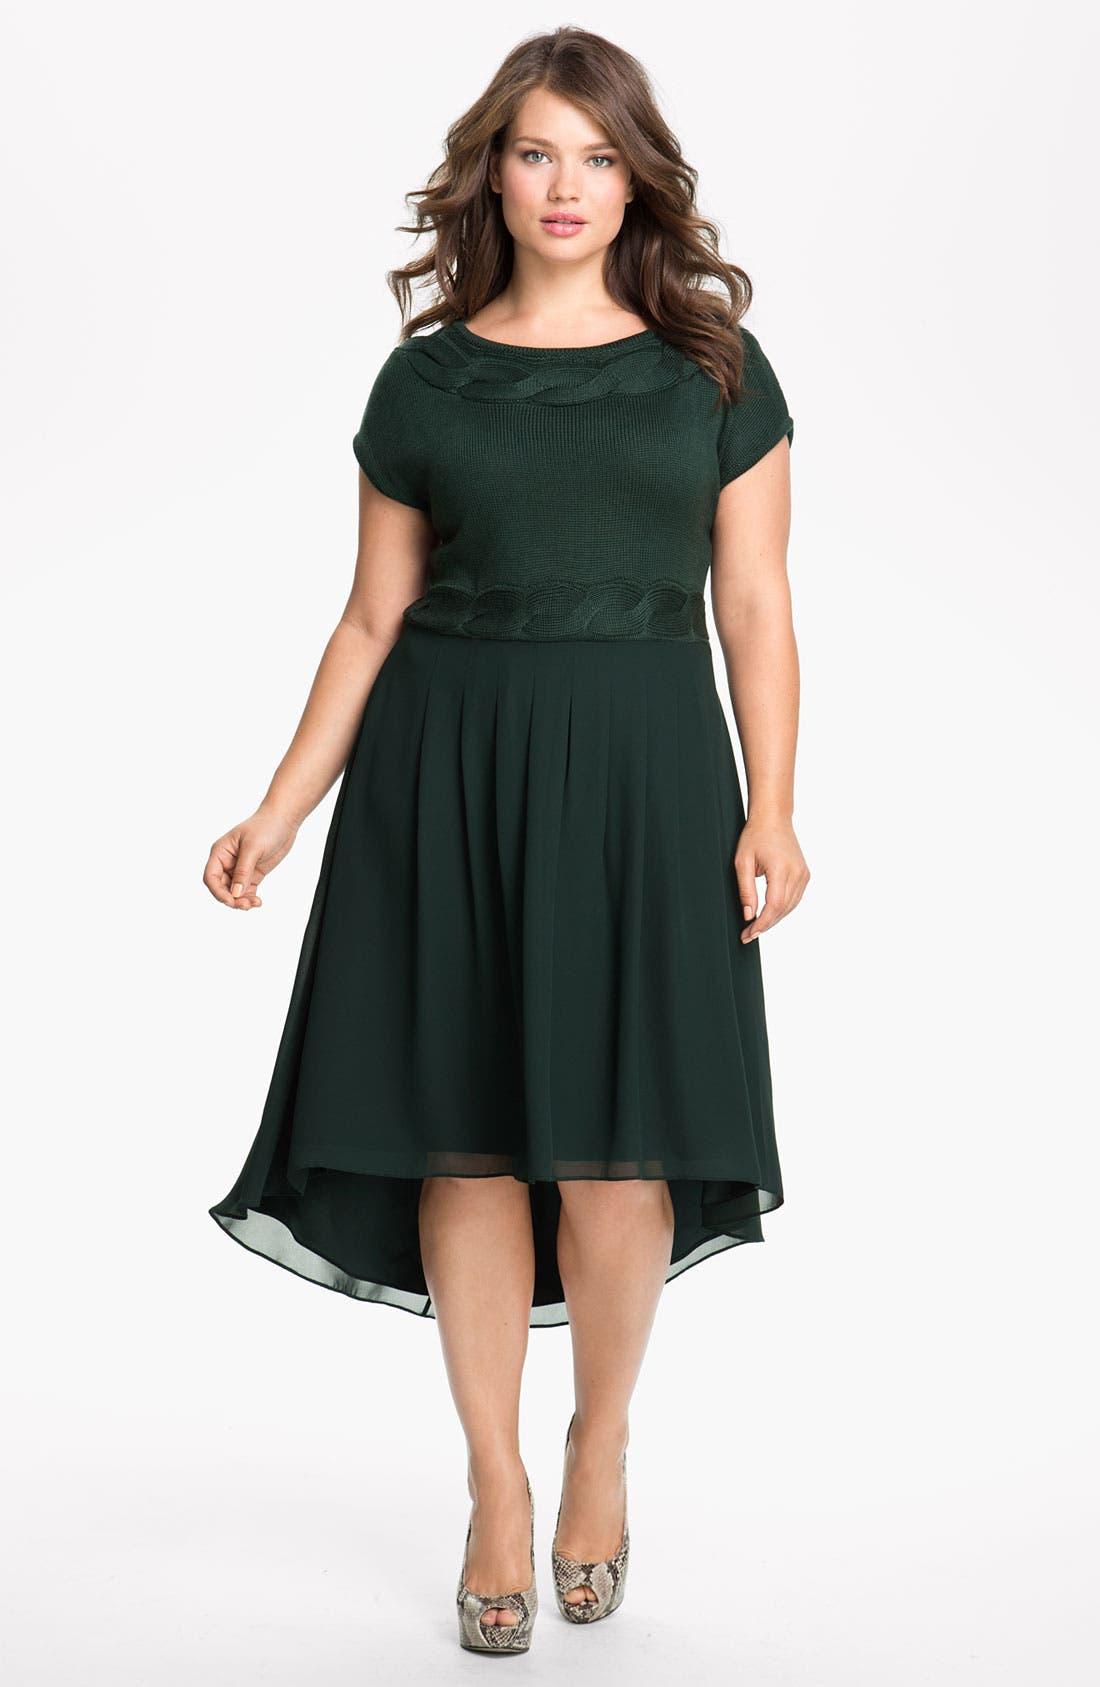 Alternate Image 1 Selected - Jessica Simpson Mock Two Piece Asymmetrical Dress (Plus)